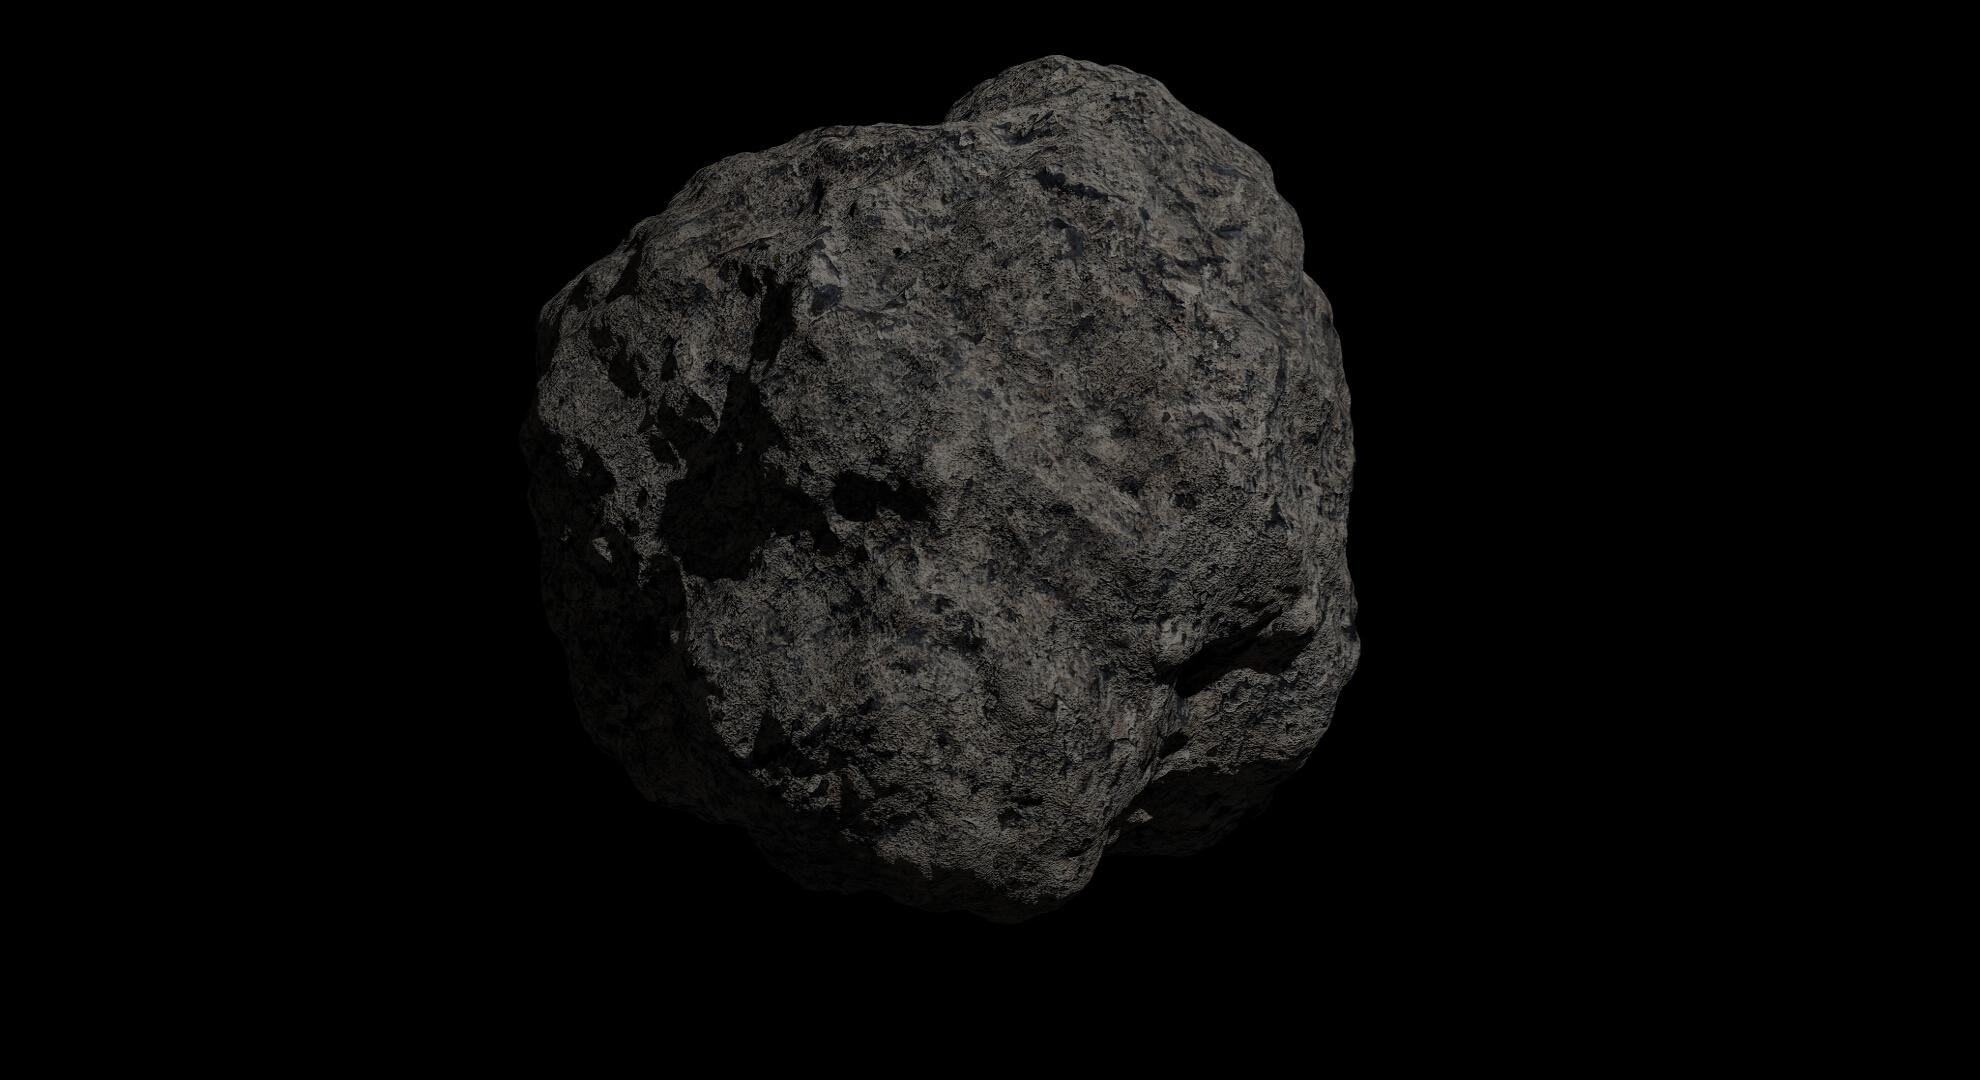 fantasy asteroid 2 3d model 3ds blend dae fbx obj 267202